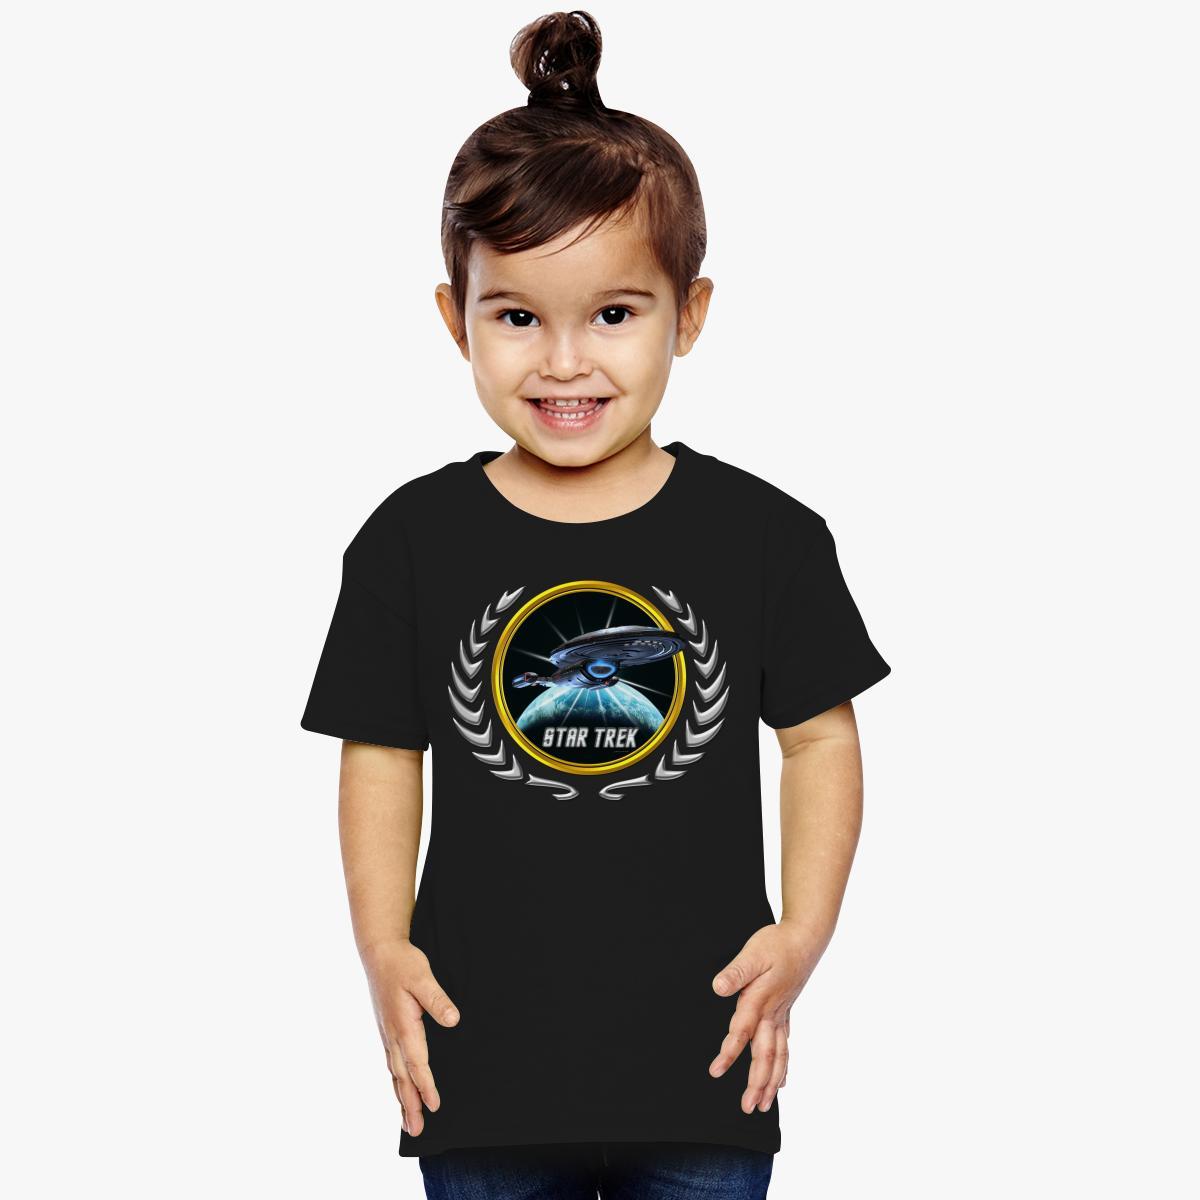 Buy Star trek Federation Planets Voyager 2 Toddler T-shirt, 529417